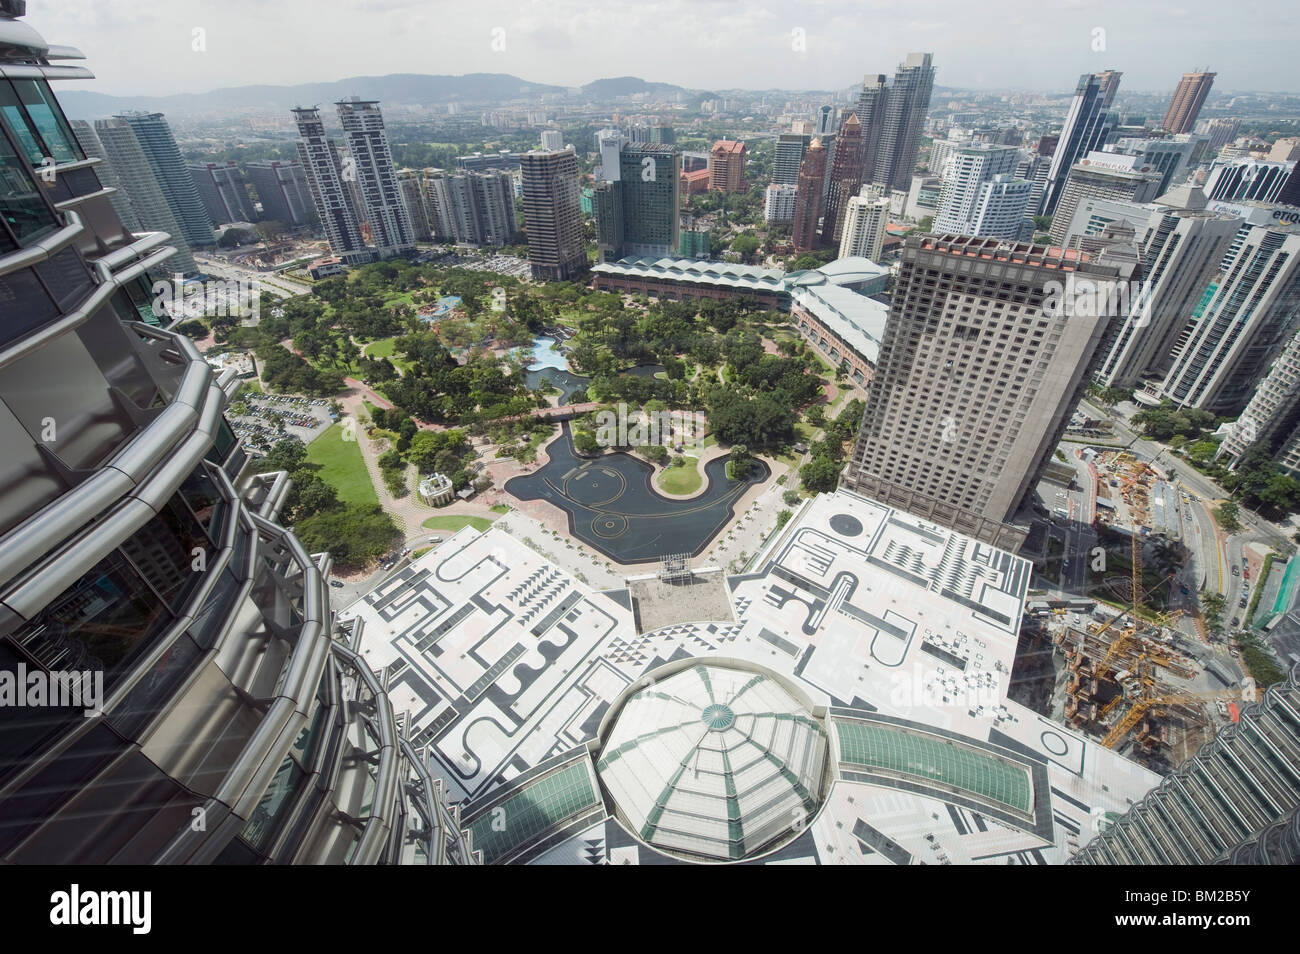 View from Petronas Towers skybridge, Kuala Lumpur, Malaysia, Southeast Asia - Stock Image